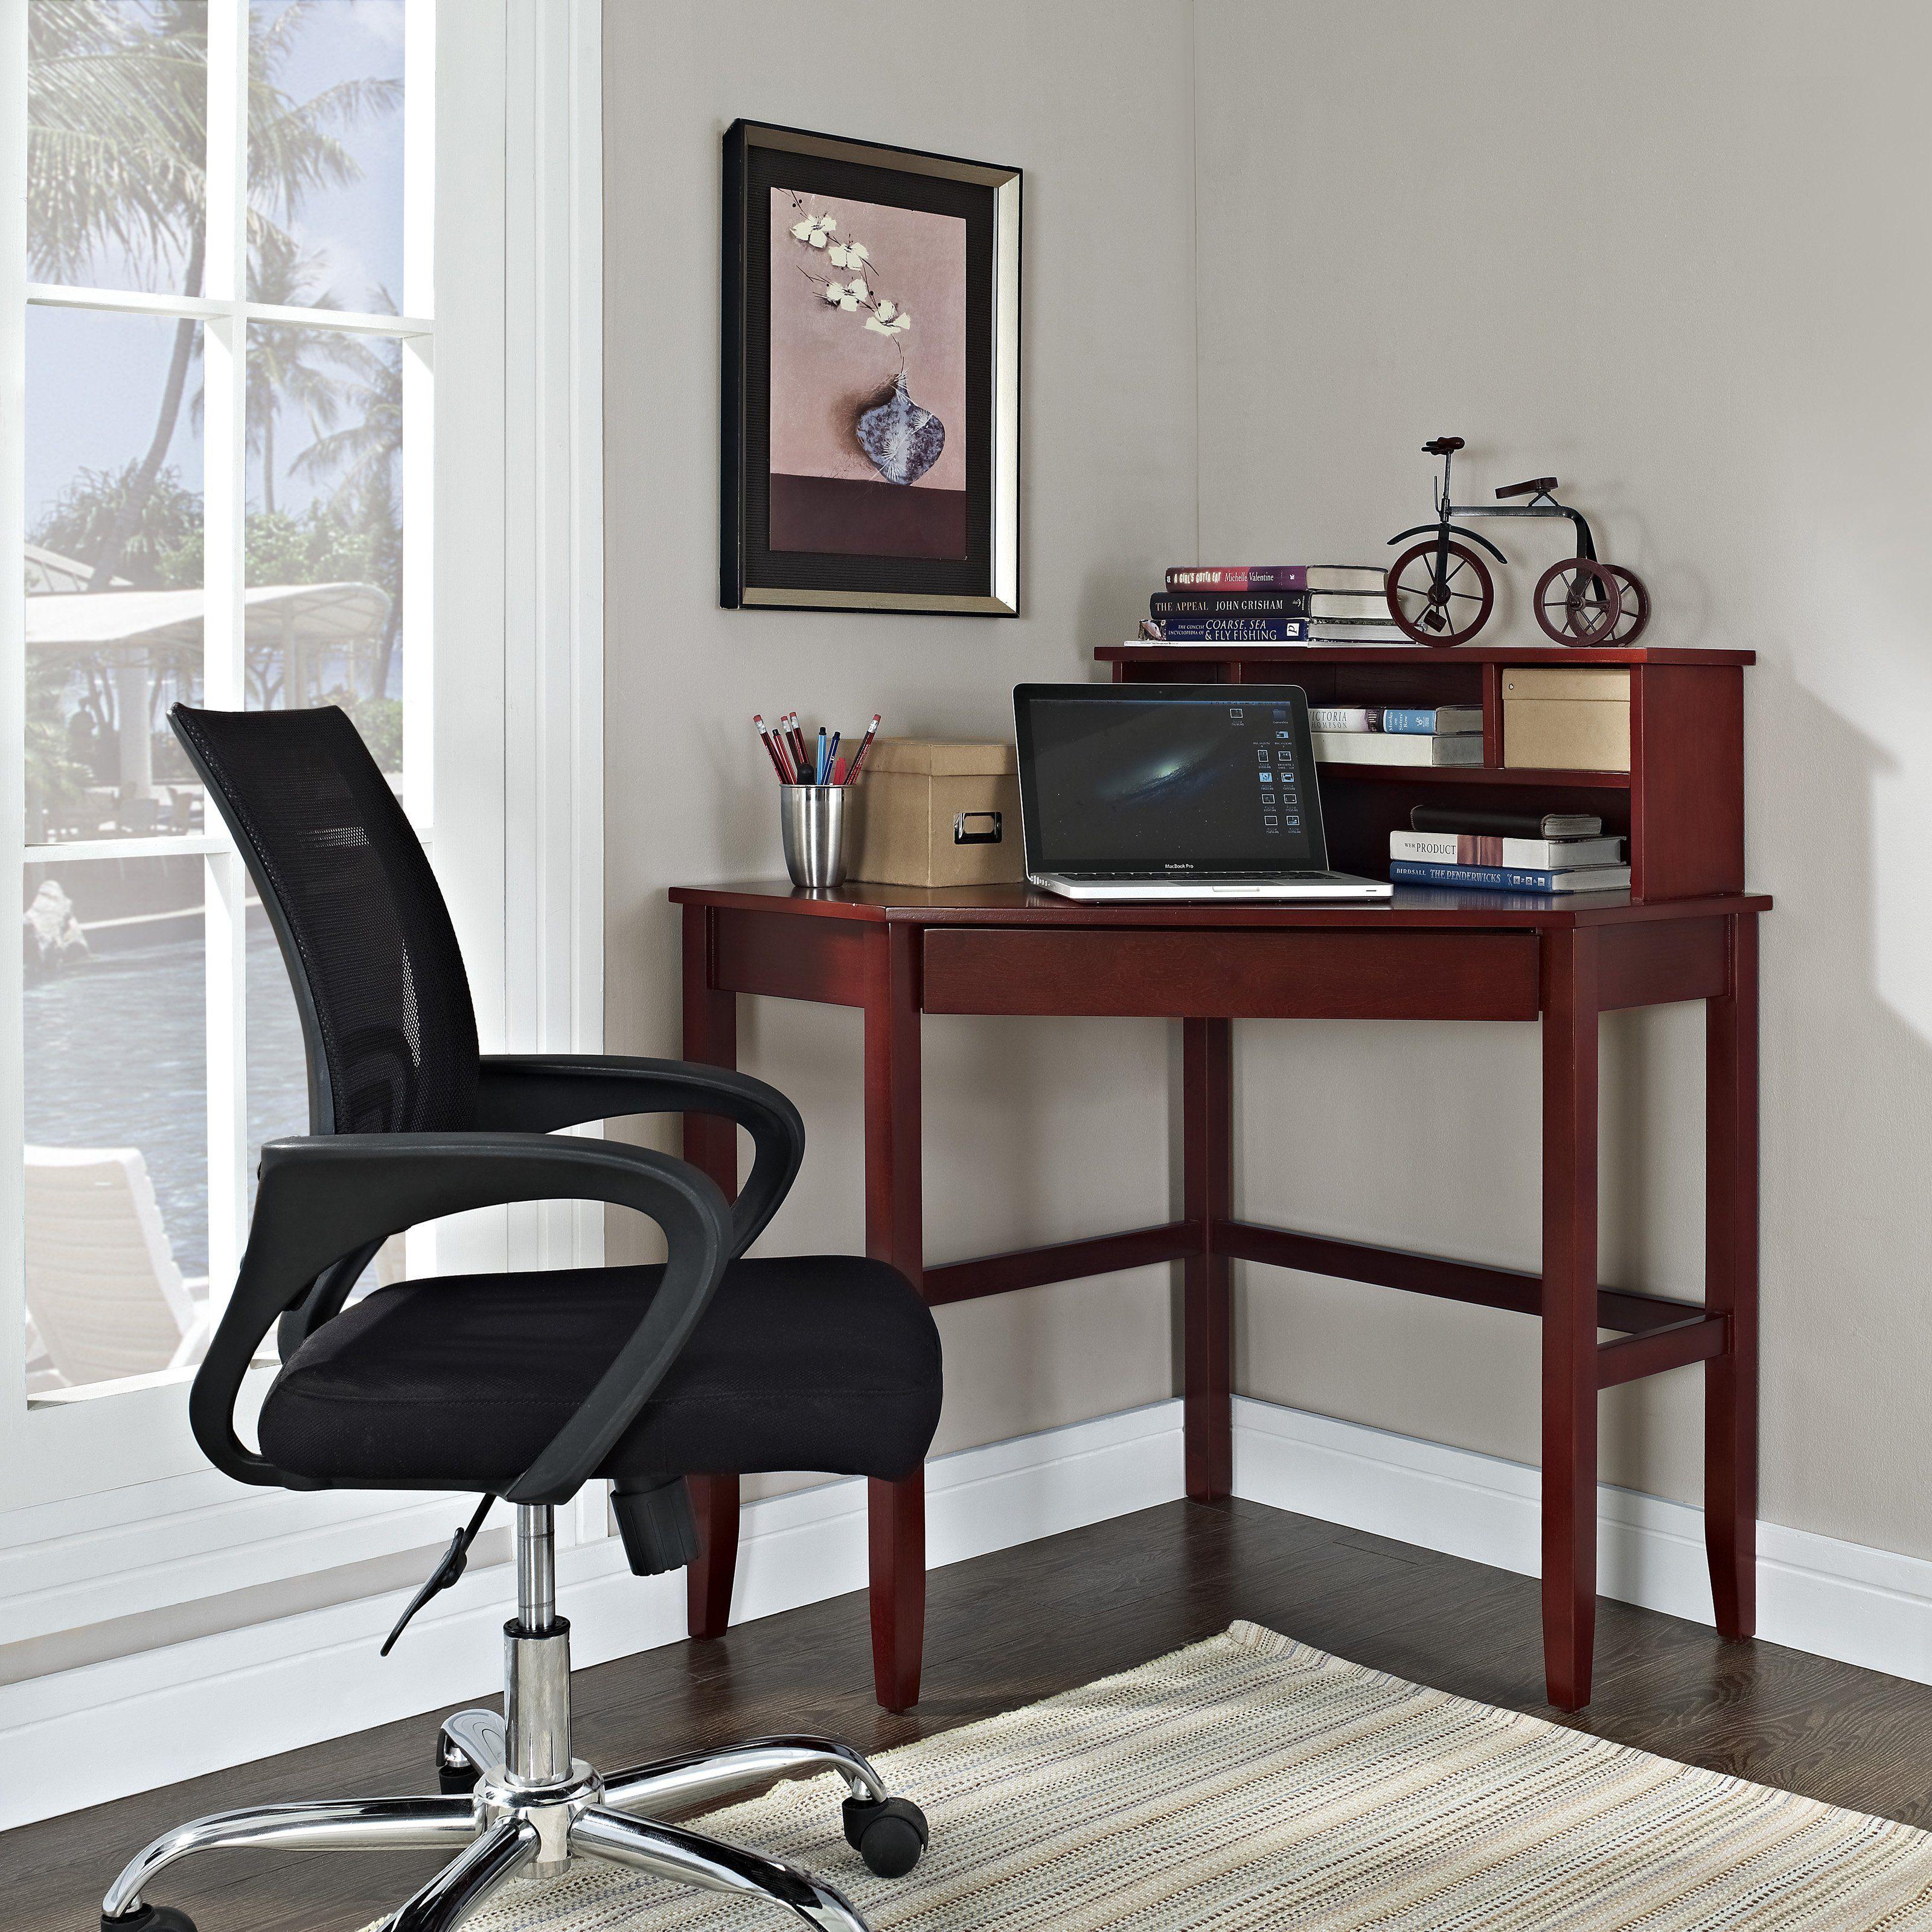 15 stunning diy corner desk designs to inspire you best on smart corner home office ideas id=79448